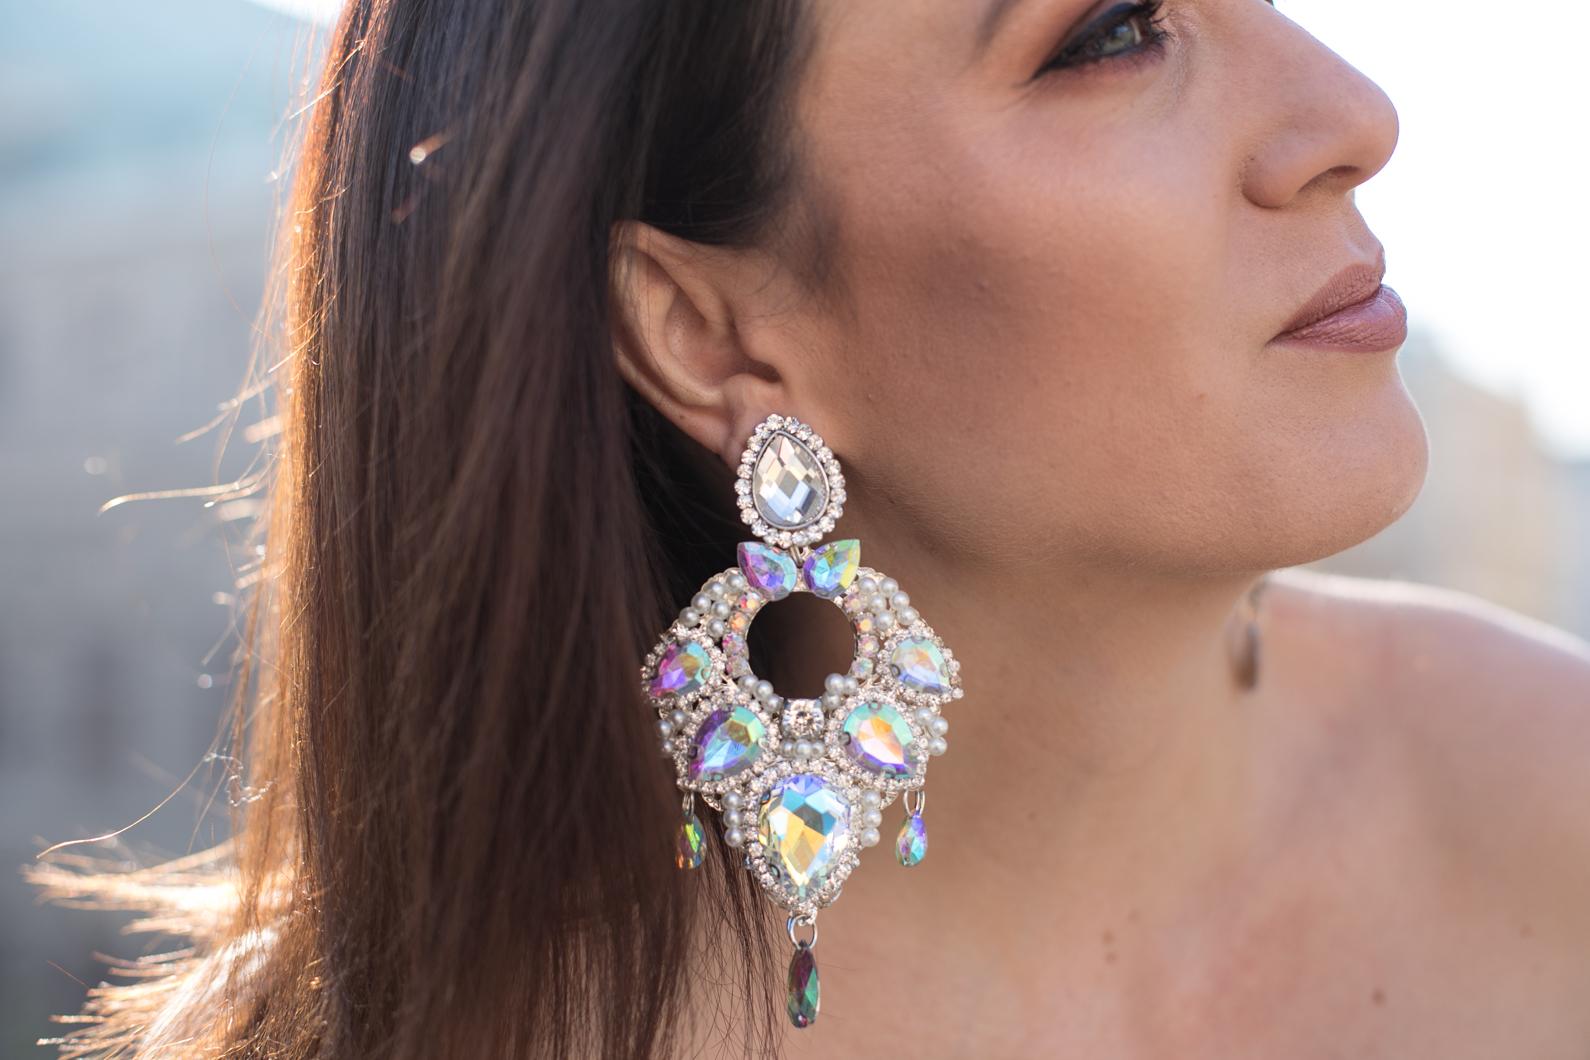 1600-Nadja-Nemetz-NadjaNemetz-Violetfleur-Violet-Fleur-Blog-Wien-WienerBlog-Beauty-Fashion-Lifestyle-Modeblog-Beautyblog-Fotografin-Bloggerin-helenadia-helena-dia-earrings-ohrringe-tkmaxx-ballsaison-1